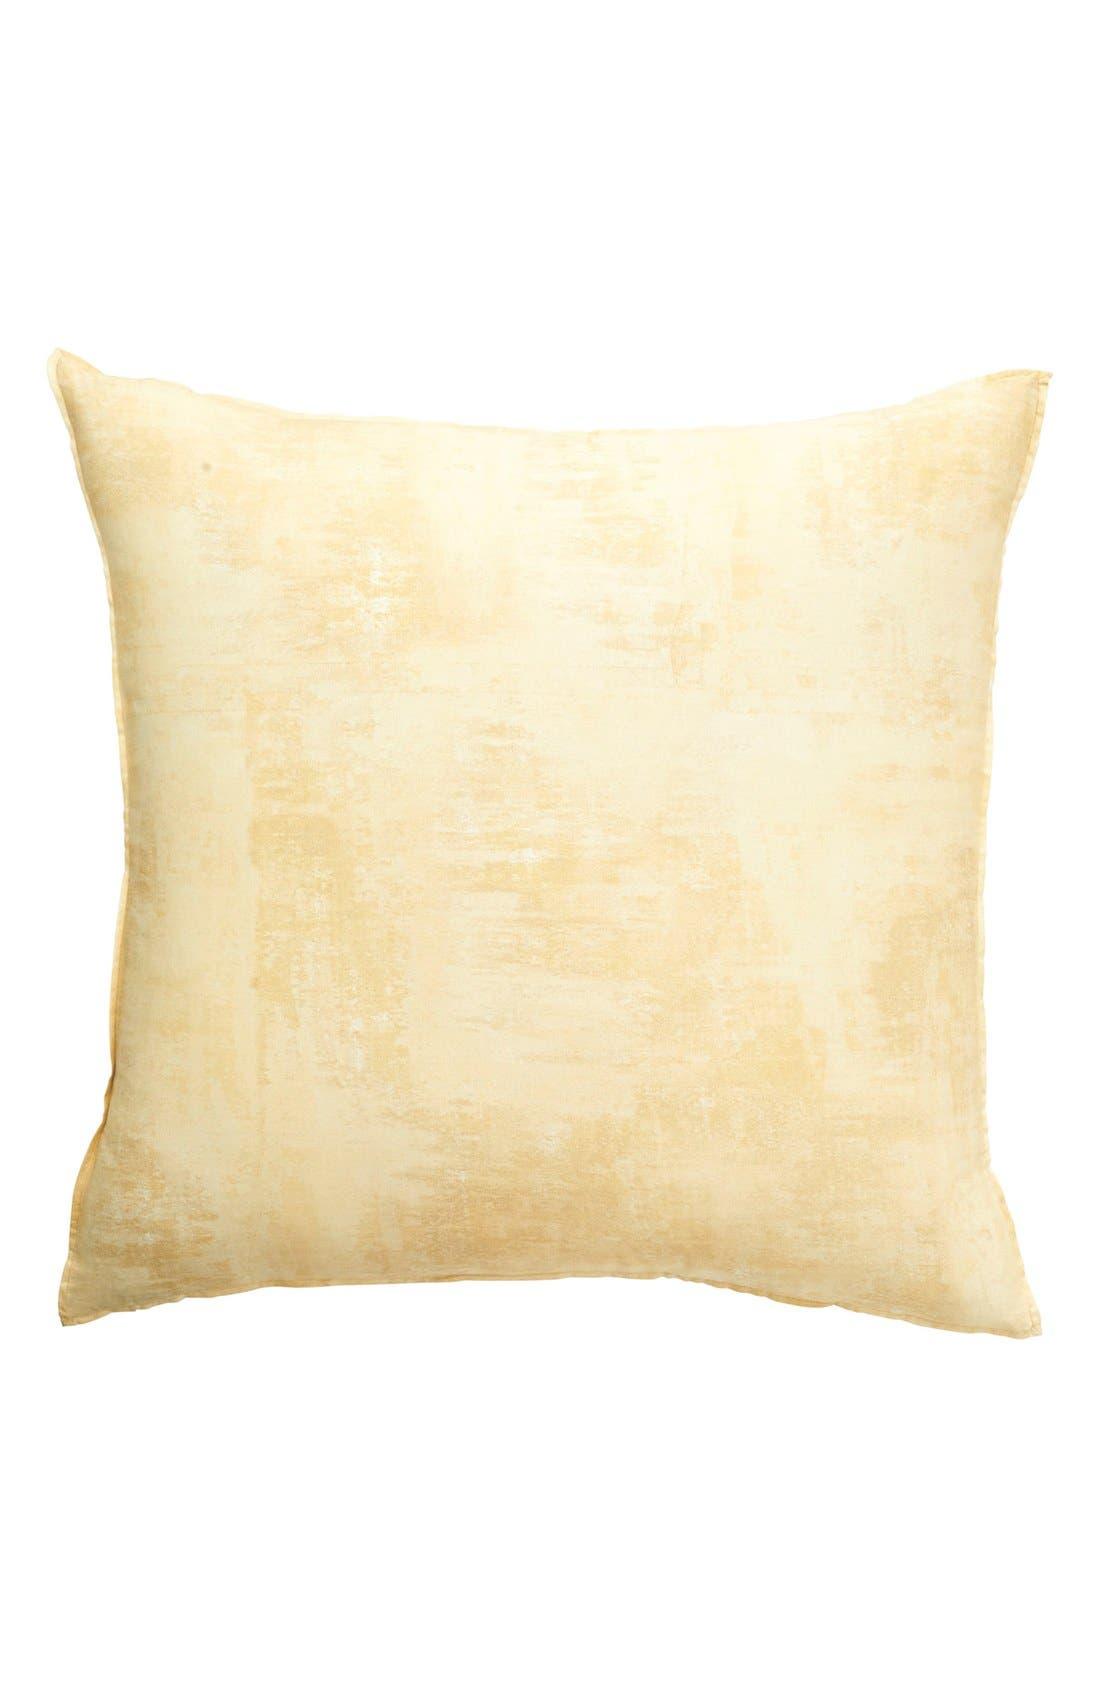 Main Image - Donna Karan 'Atmosphere' Euro Pillow Sham (Online Only)